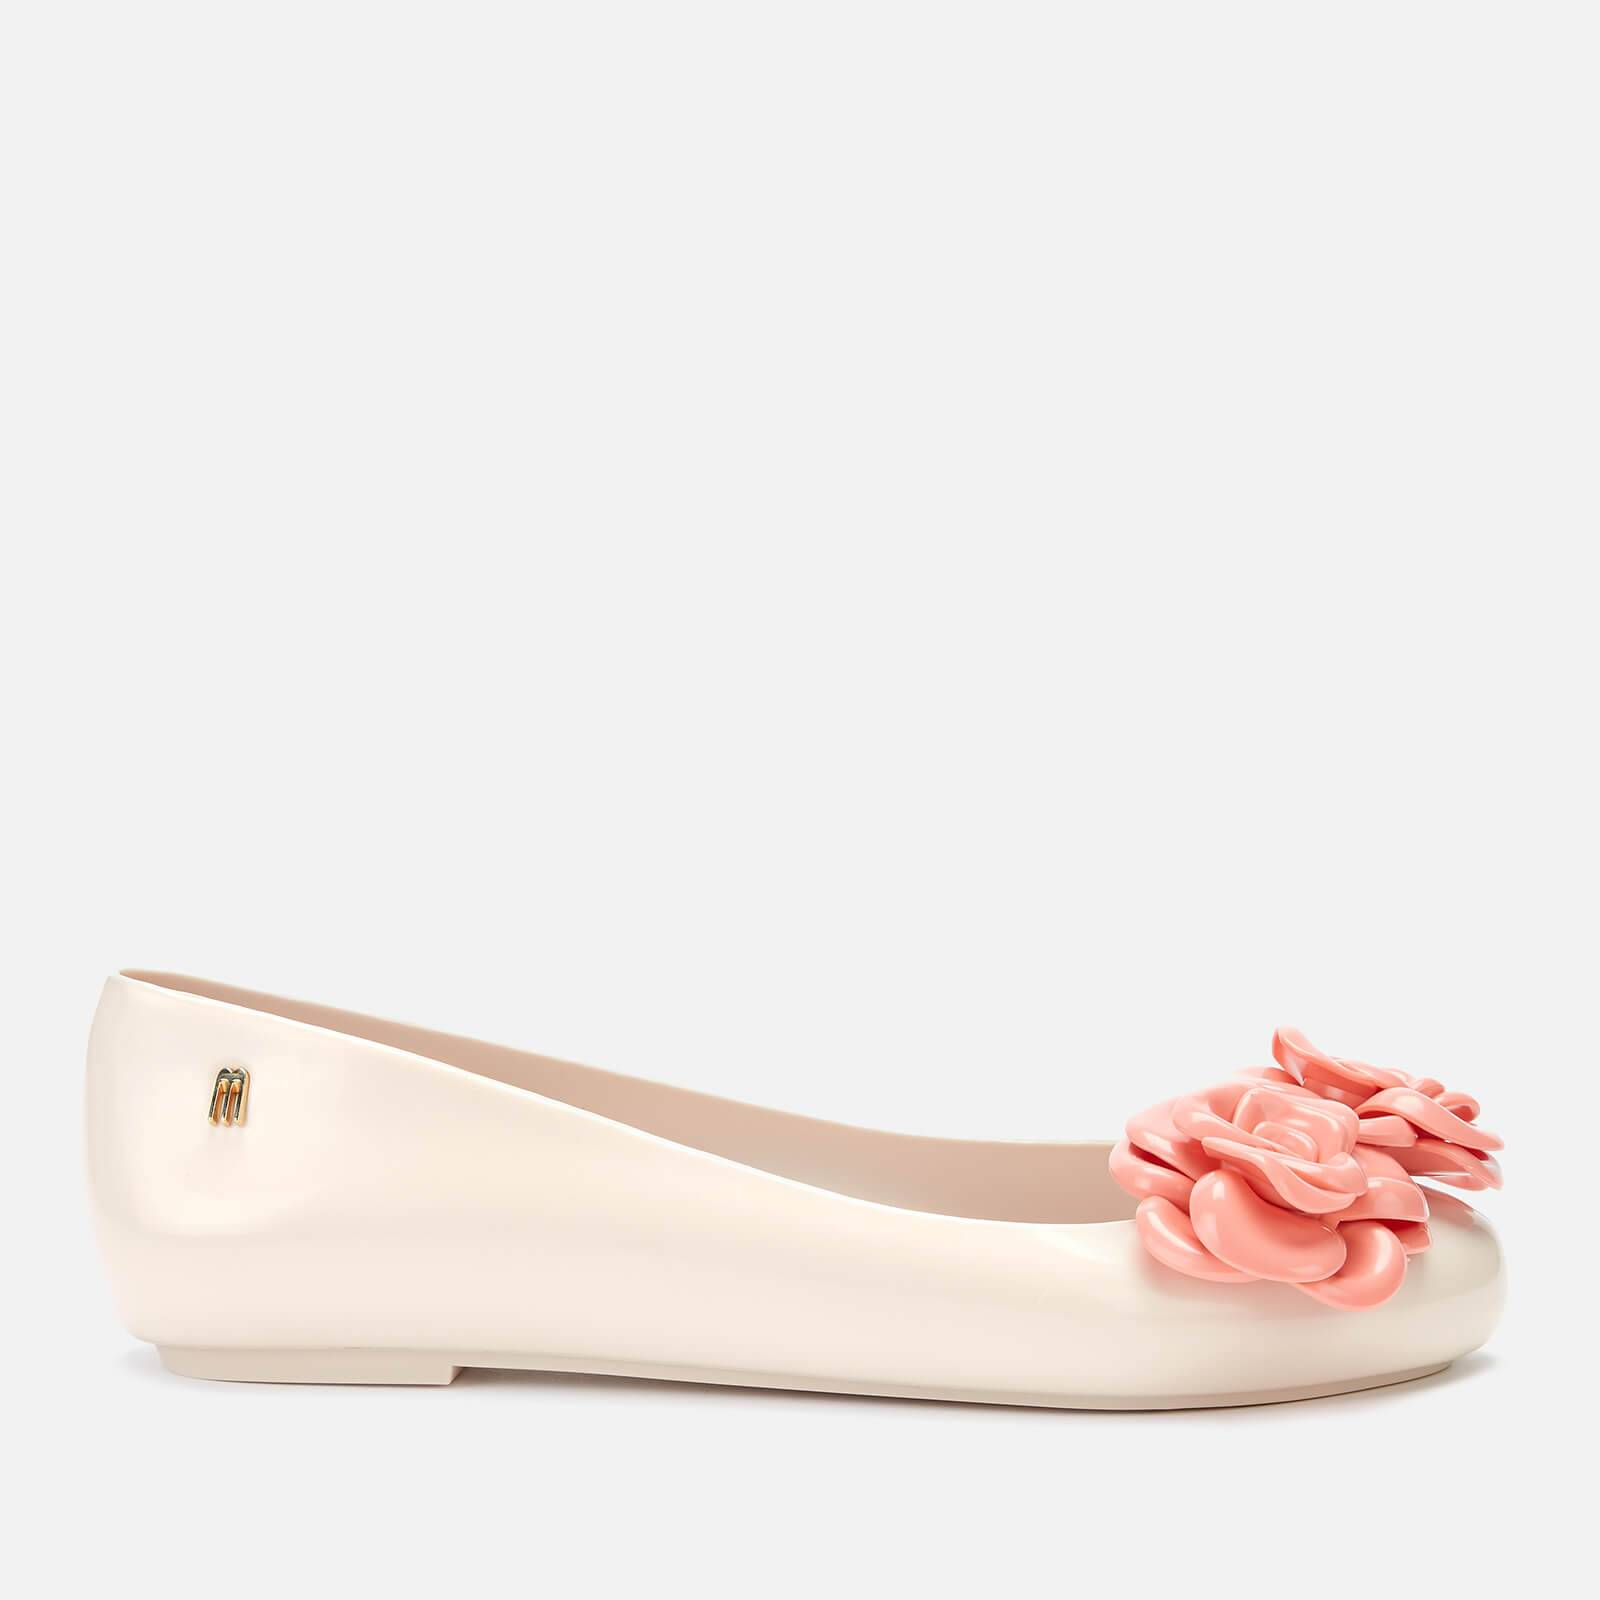 Melissa Women's Space Love Flower Ballet Flats - Coral Contrast - UK 3 - Pink